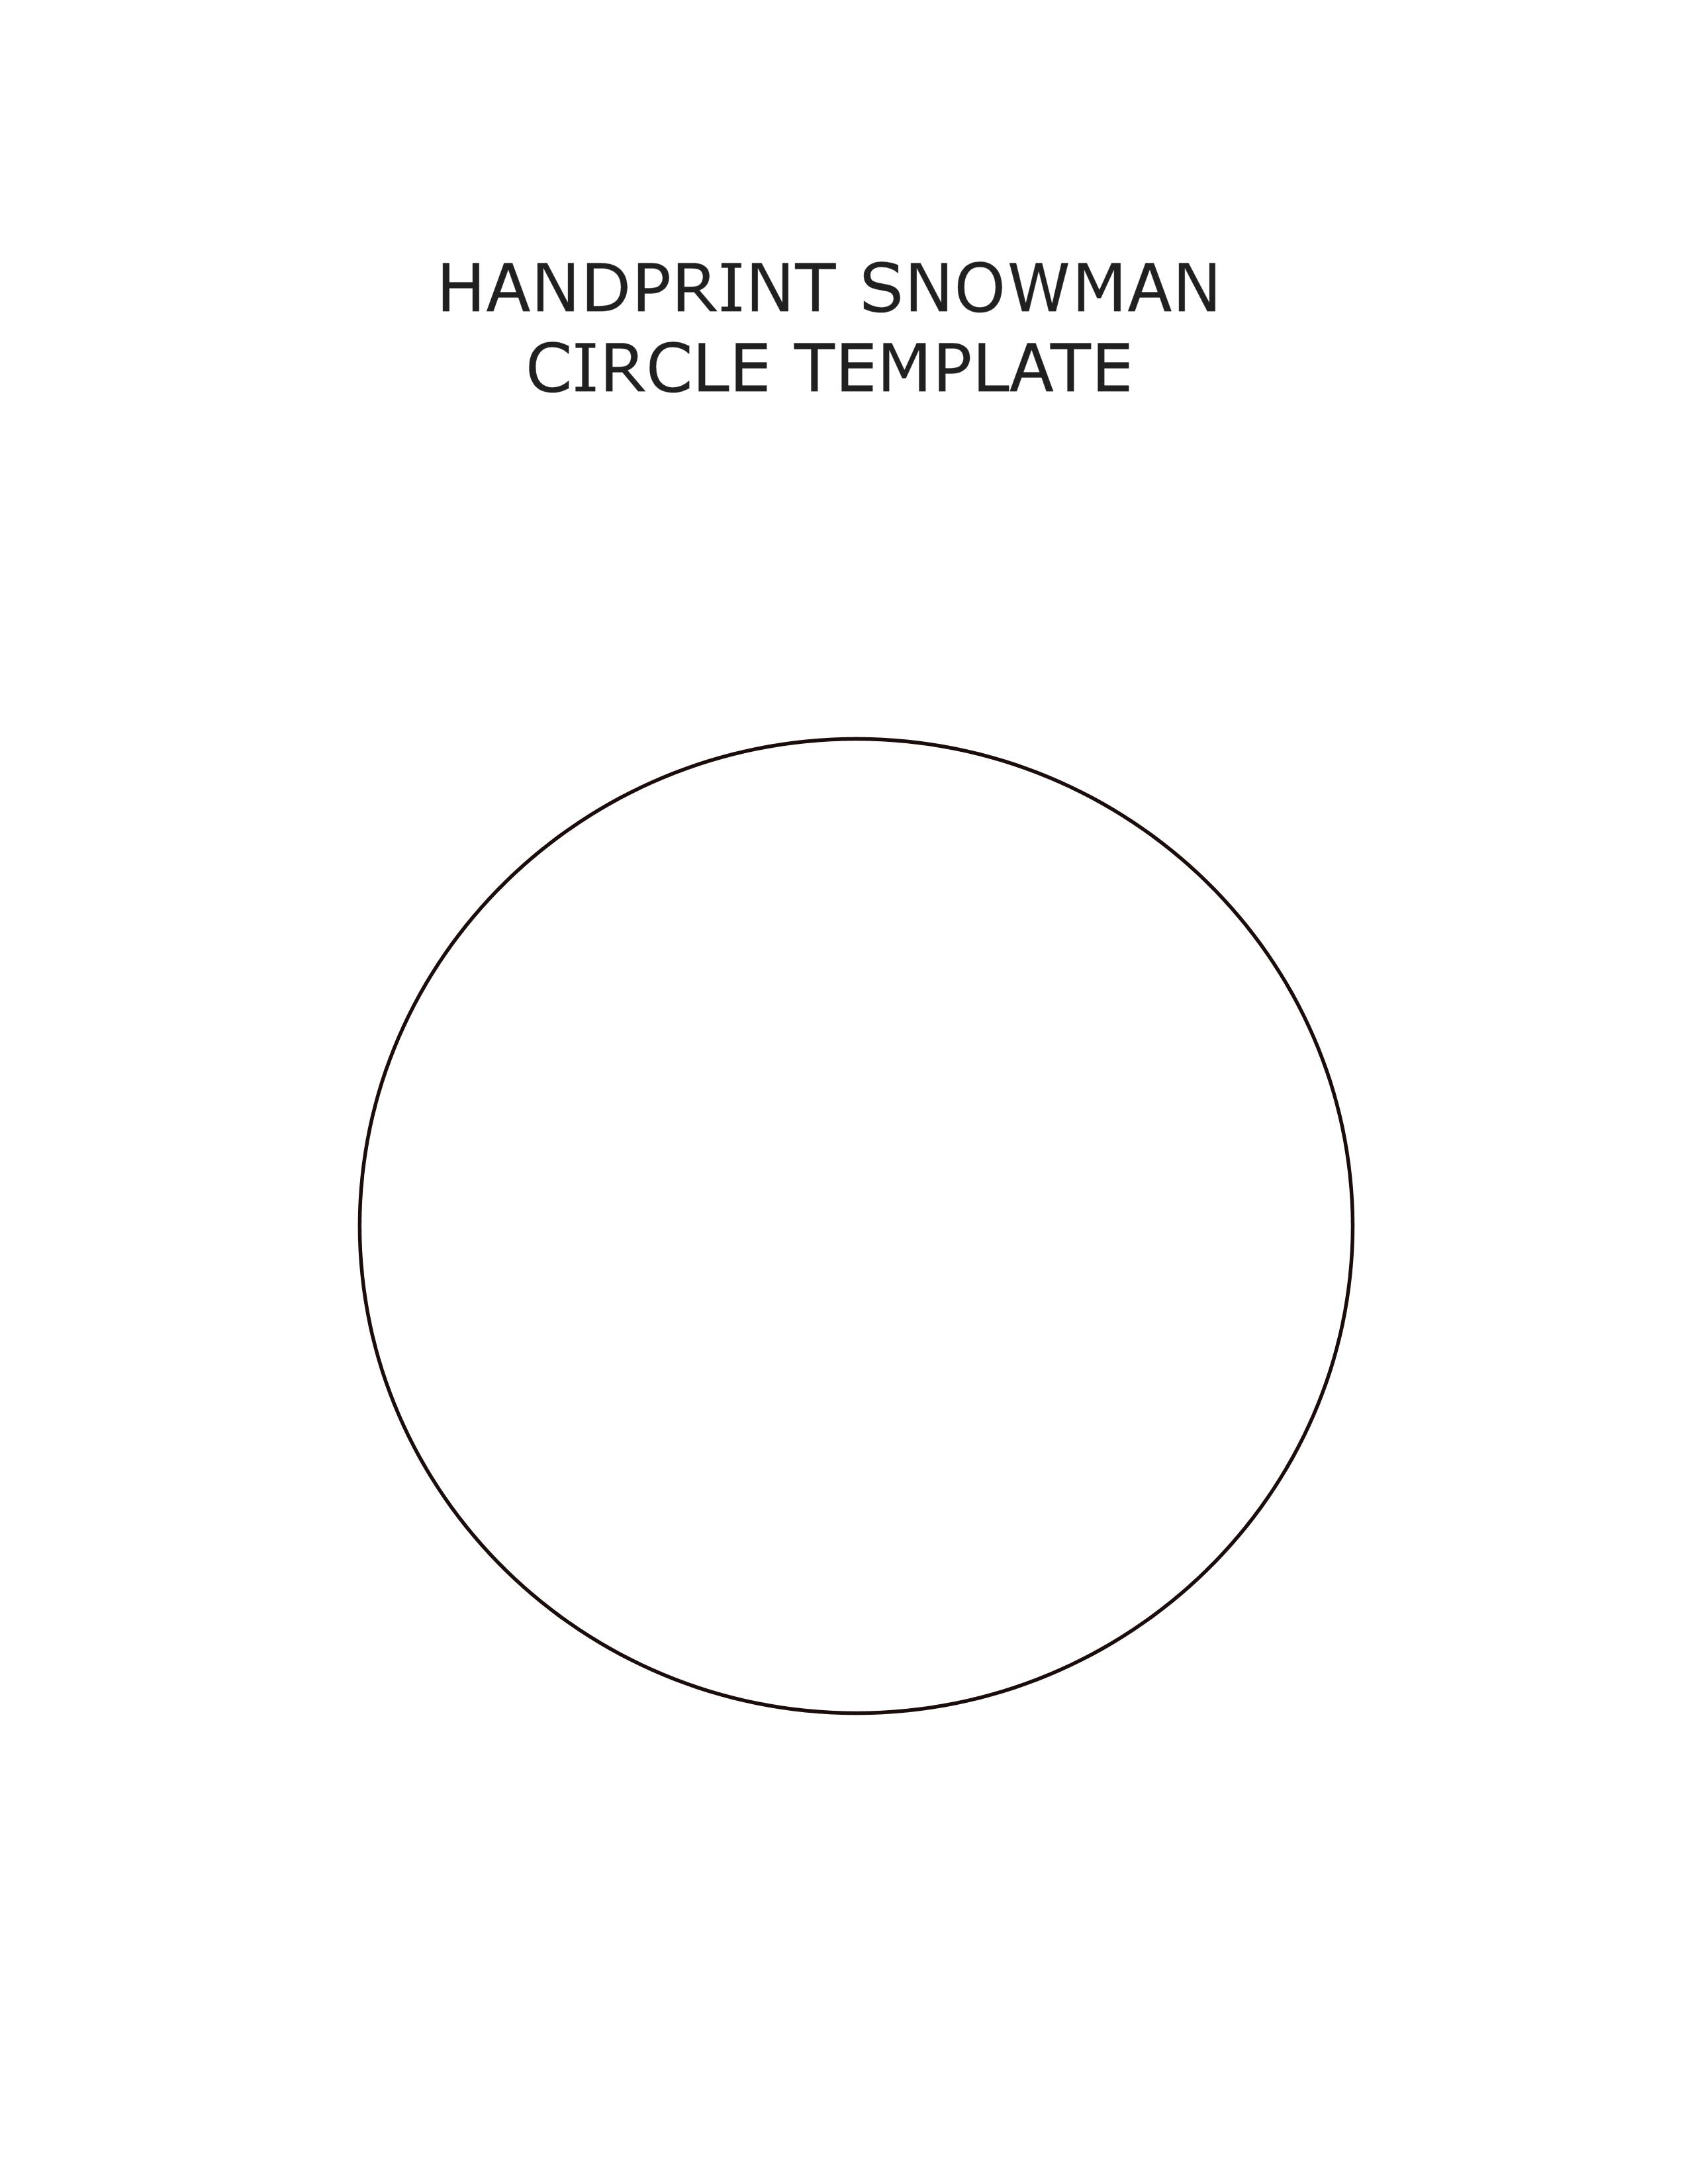 handprint-snowman-circle-template